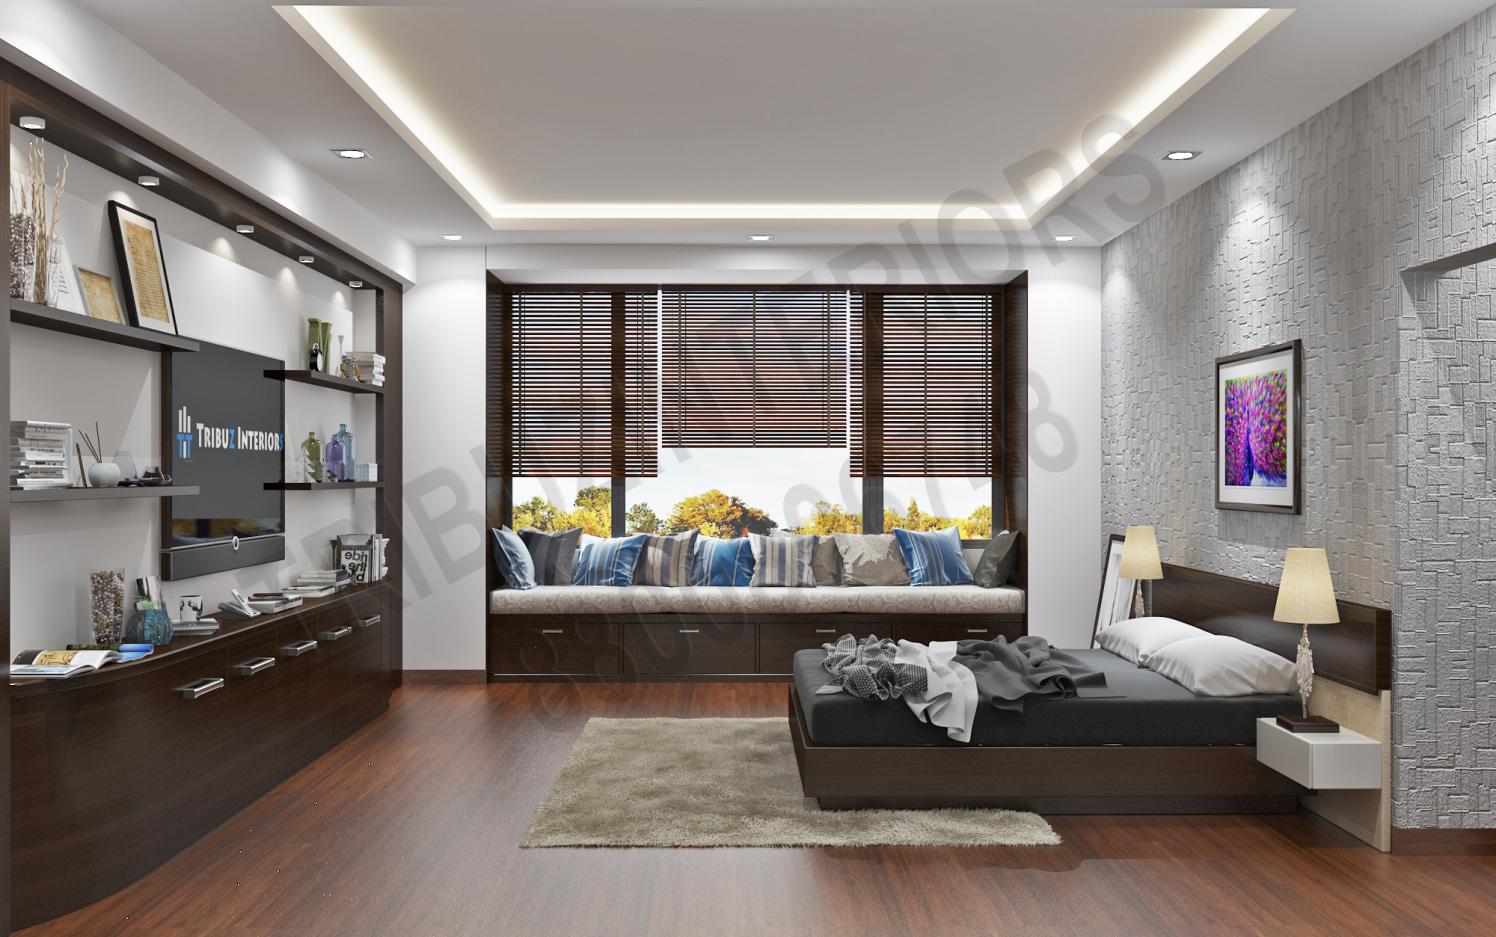 Bedroom With Designer Wall Art And Wooden Floor by Tribuz Interiors Pvt. Ltd. Bedroom Modern   Interior Design Photos & Ideas